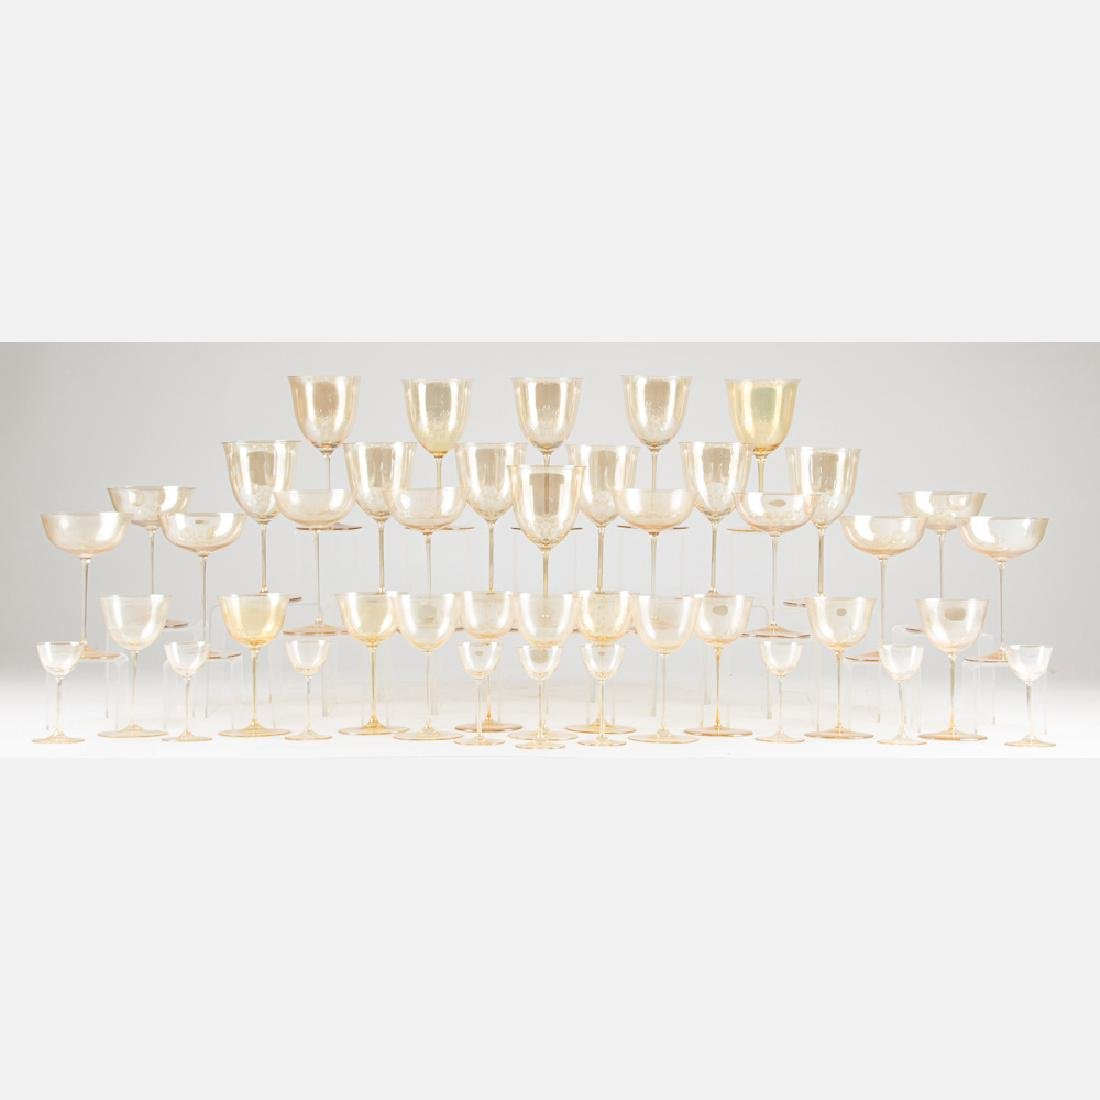 A Set of Blown Glass Stemware by J. & L. Lobmeyr